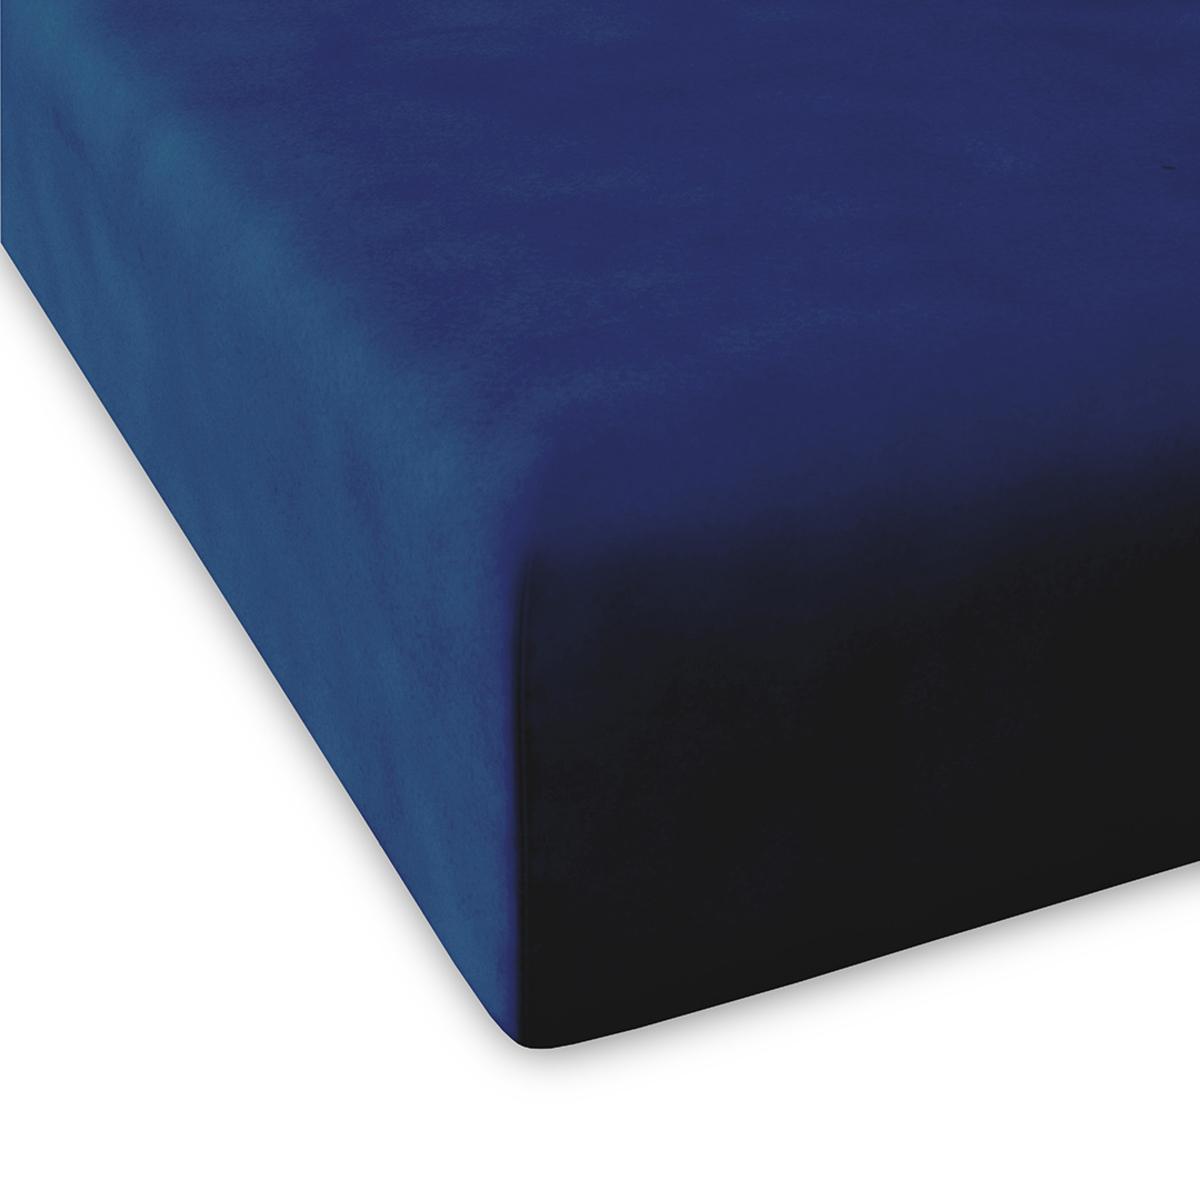 Drap housse en coton bleu marine 160x200